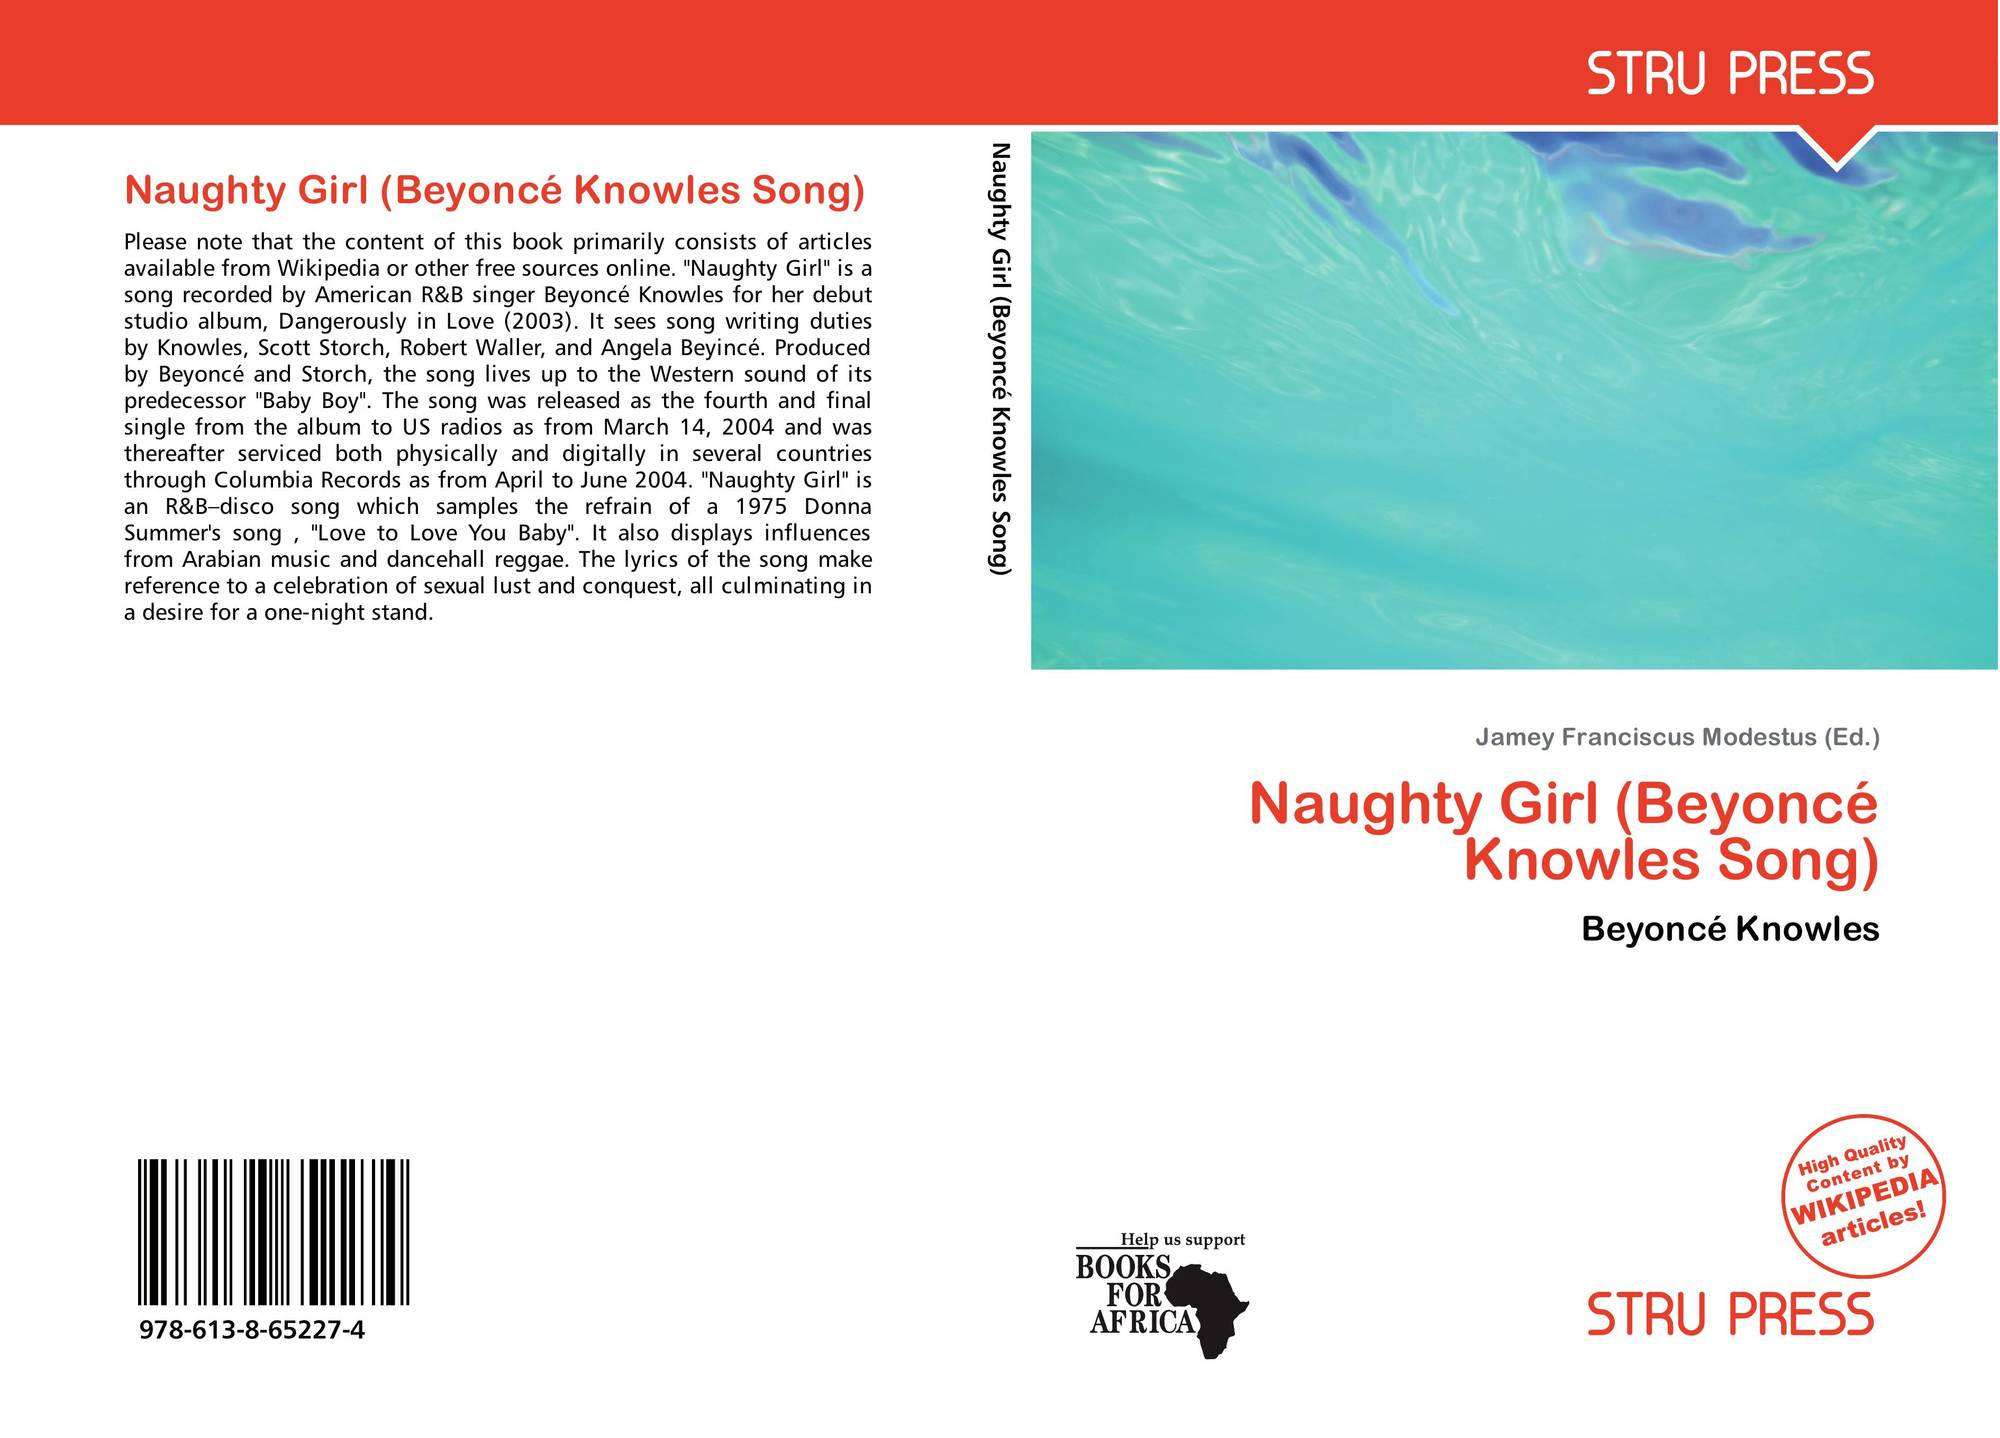 Naughty Girl (Beyoncé Knowles Song), 978-613-8-65227-4, 6138652274